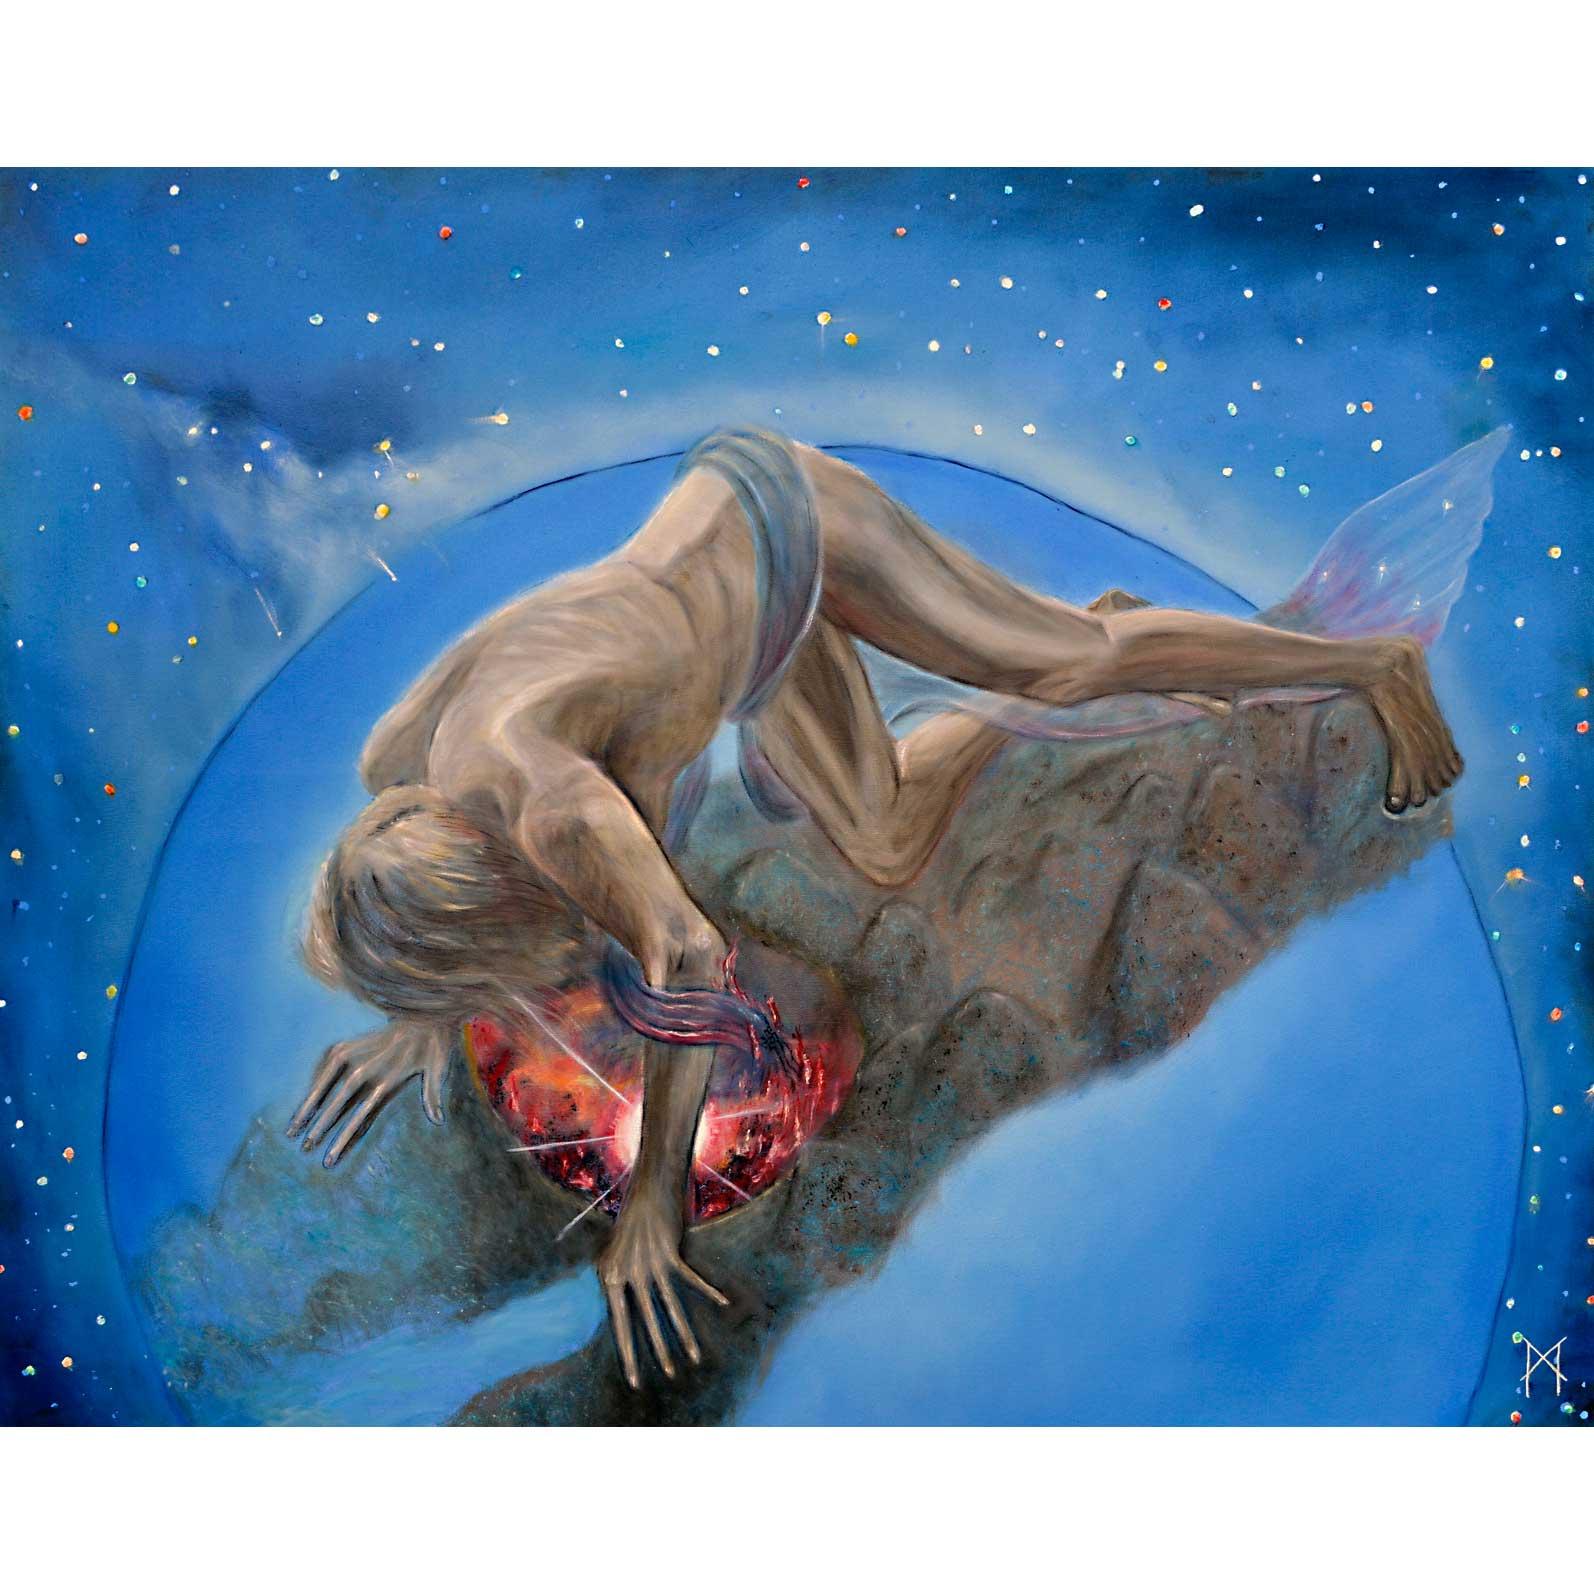 Margaretha Gubernale Fire of God 80 cm x 100 cm oil on canvas 2016